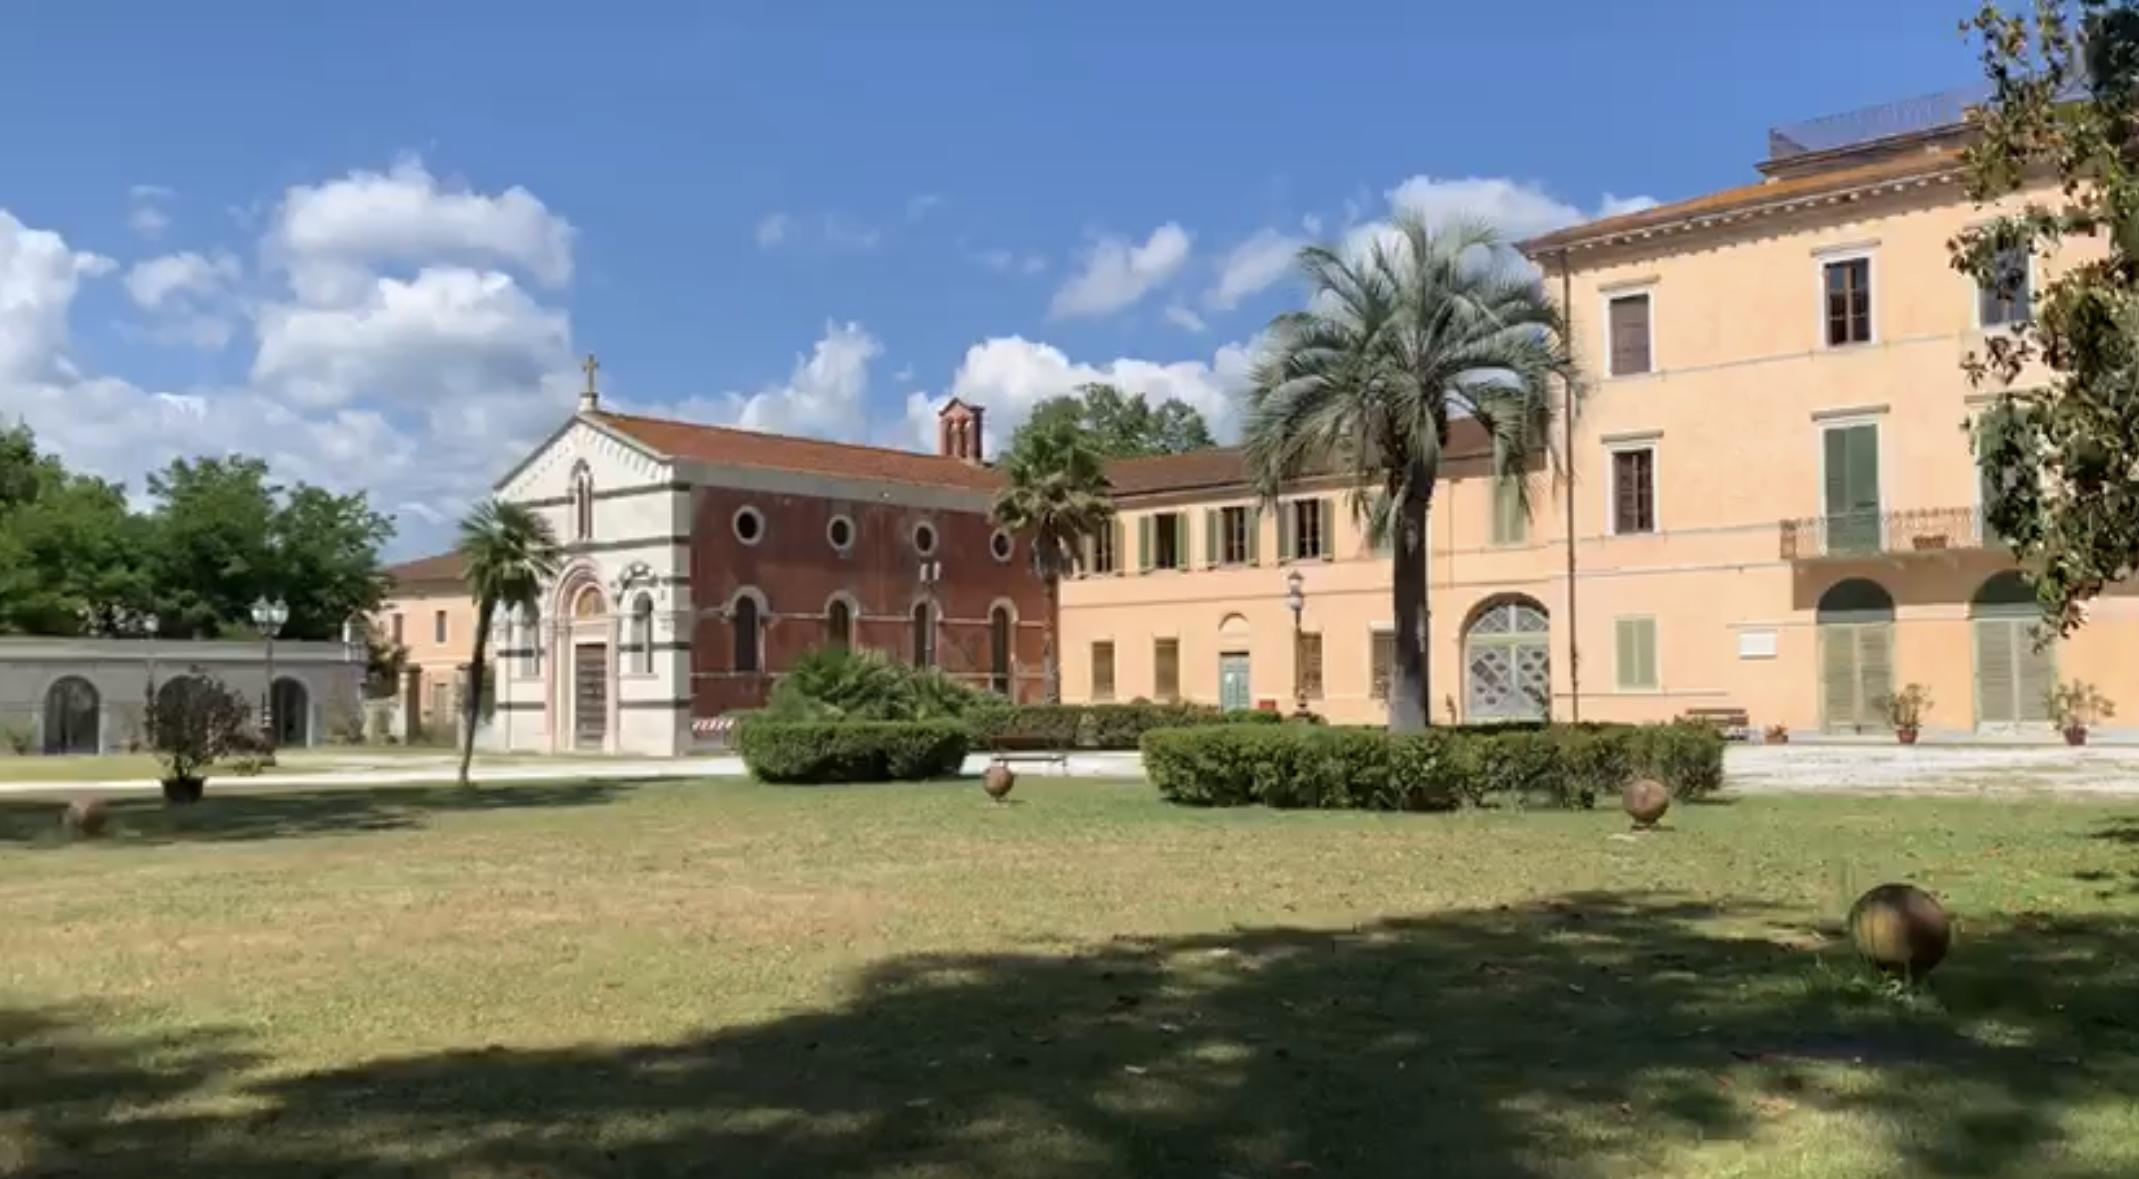 Fondazione ISYL